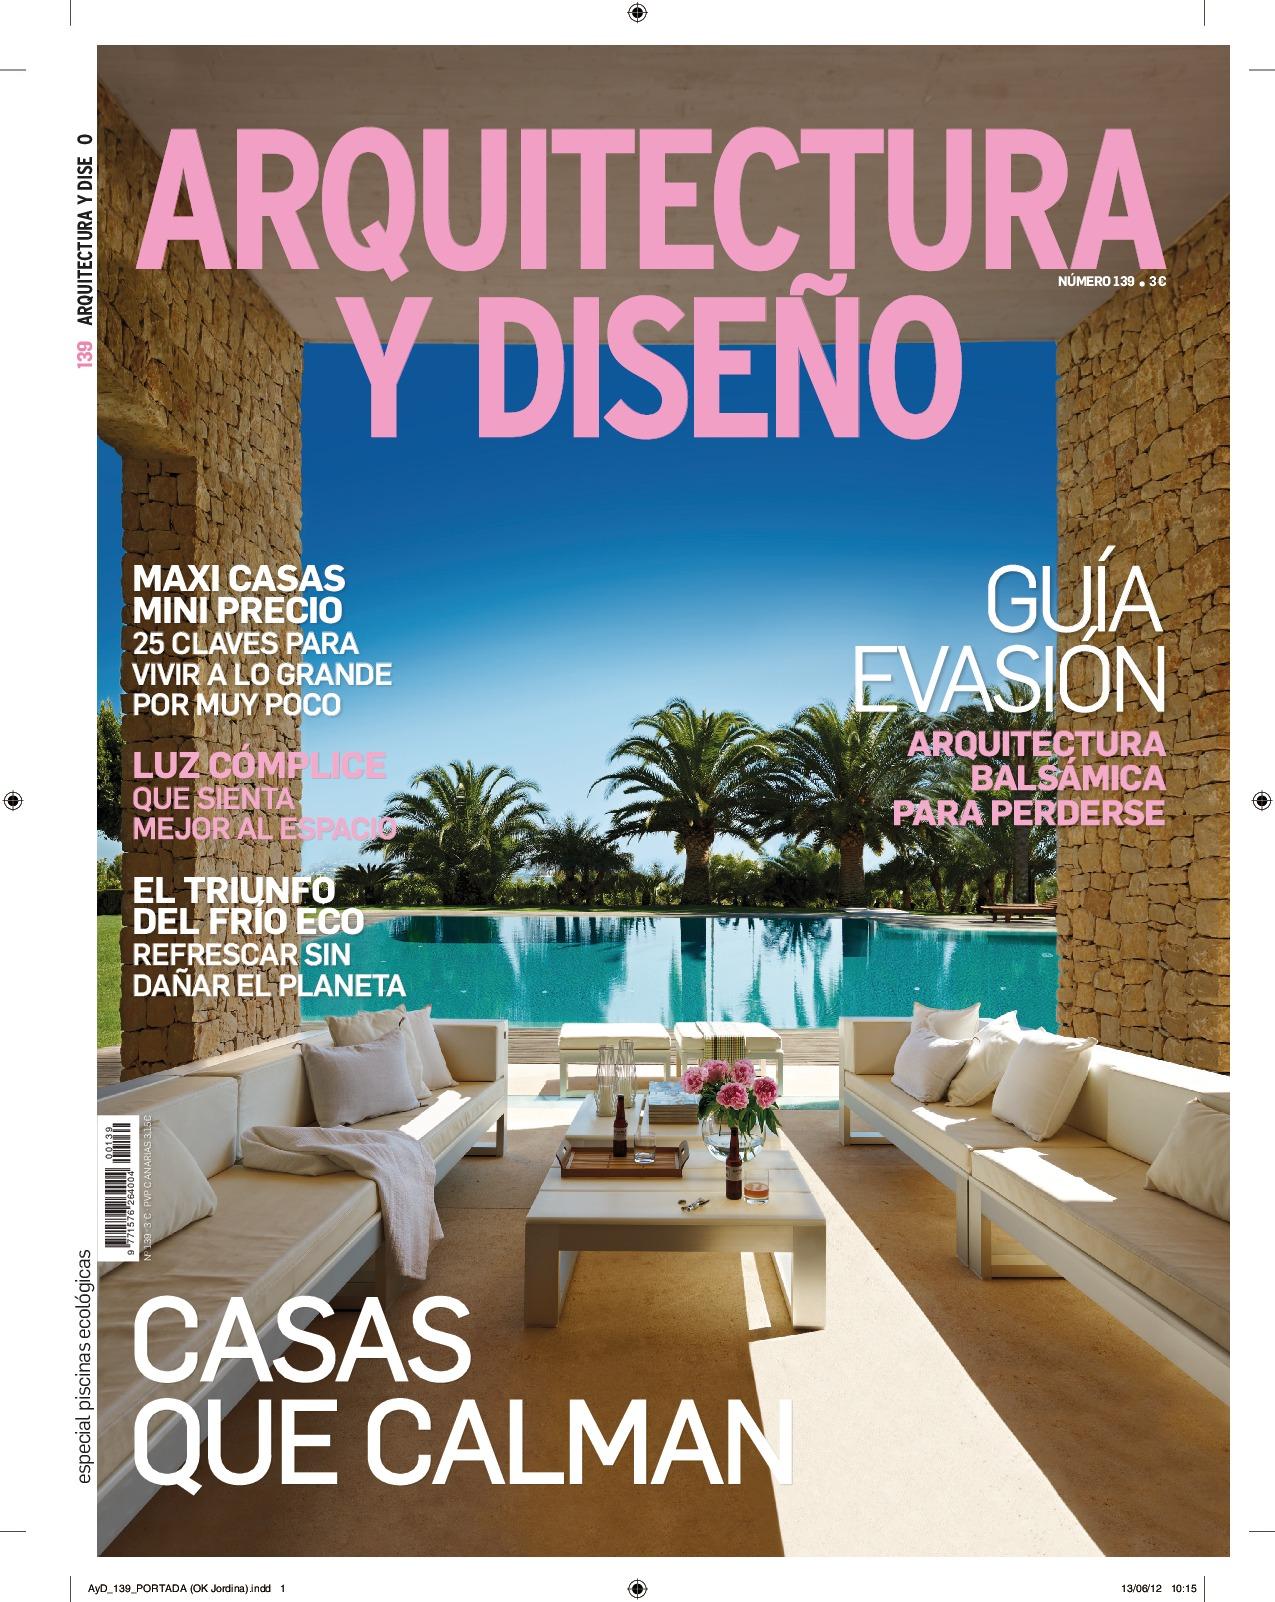 Arquitectura_y_Diseño_Luglio2012_-0